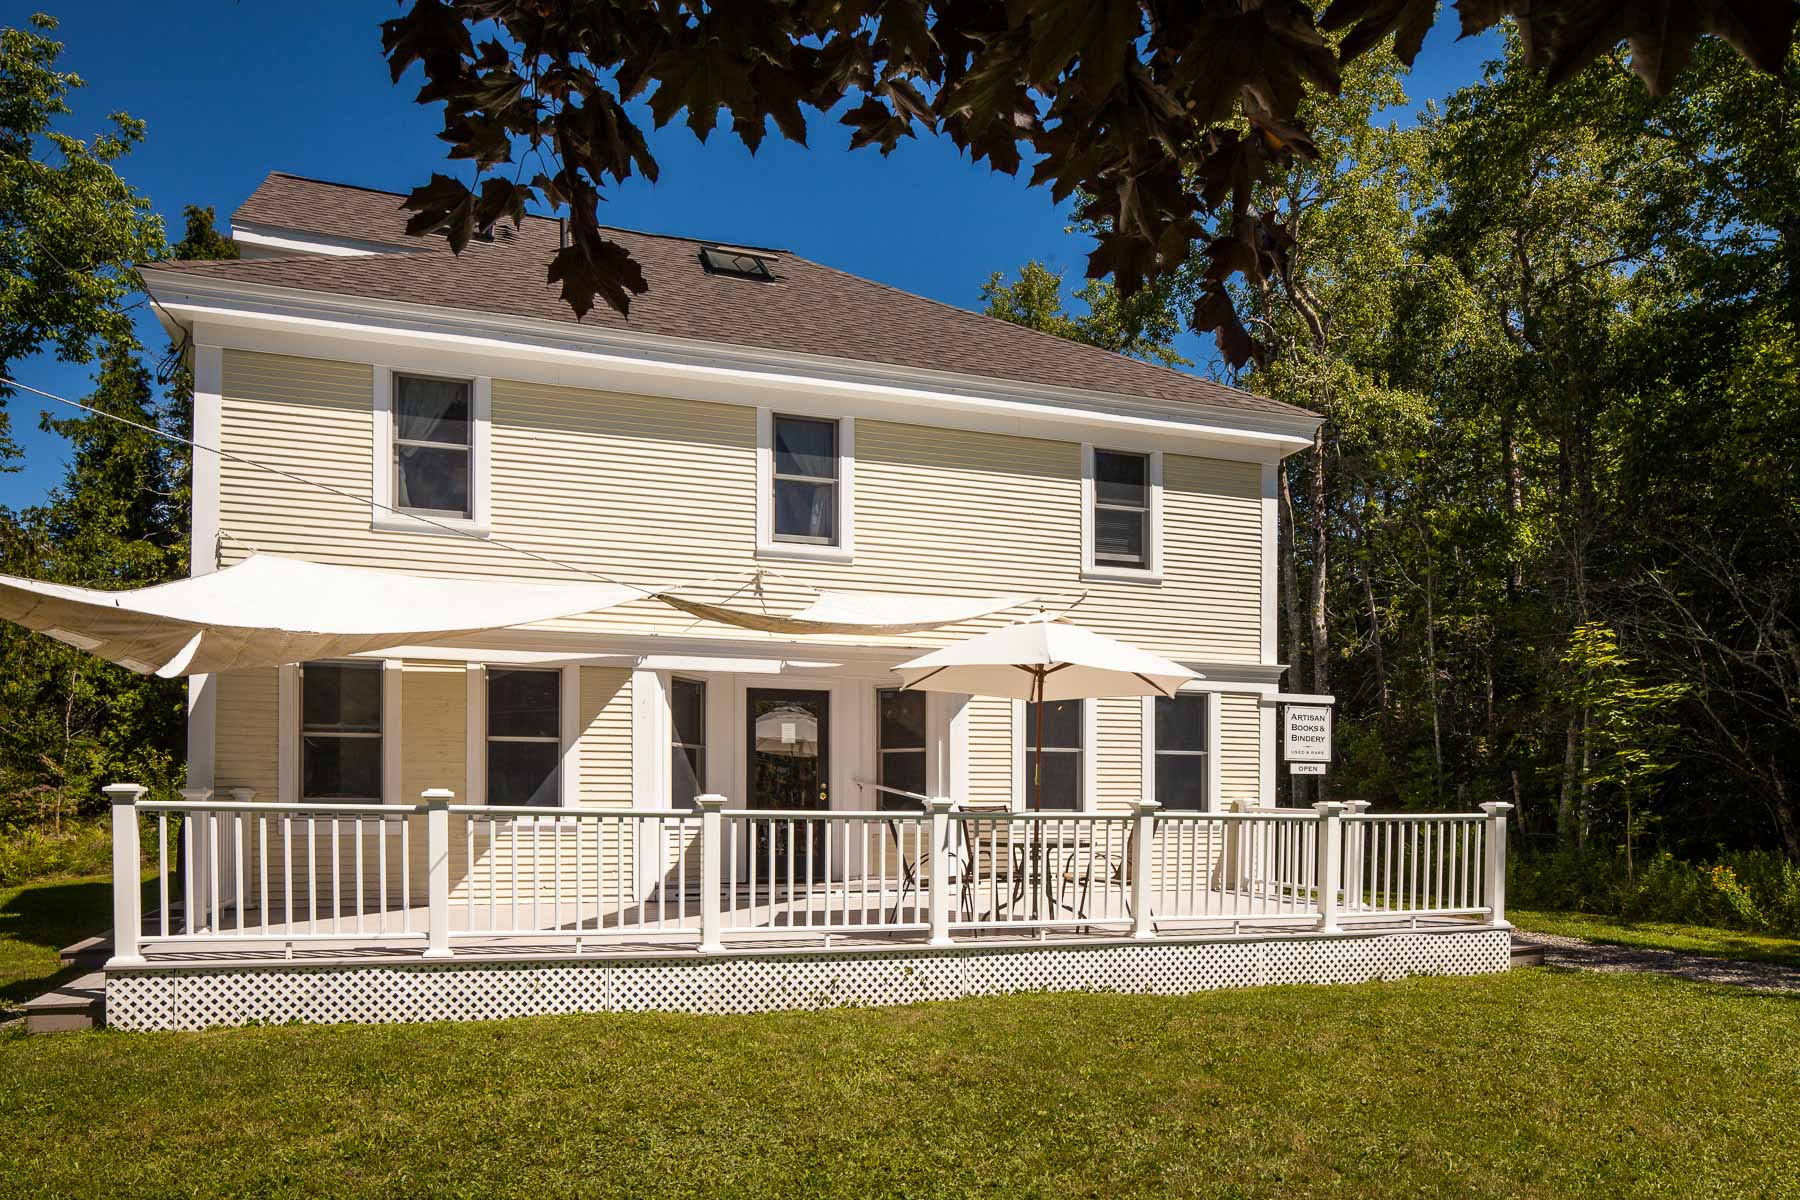 Moradia para Venda às 111 Derby Road Islesboro, Maine, 04848 Estados Unidos